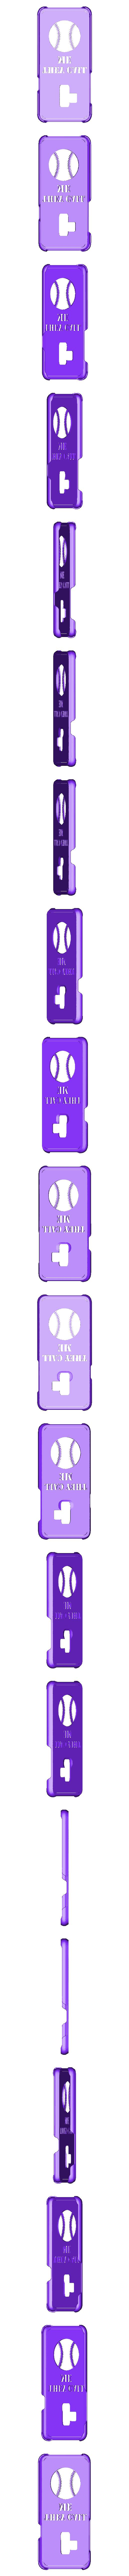 they_call_me_baseball.stl Télécharger fichier STL gratuit Etui de téléphone Samsung Galaxy S9 Custom Baseball • Modèle à imprimer en 3D, mmjames